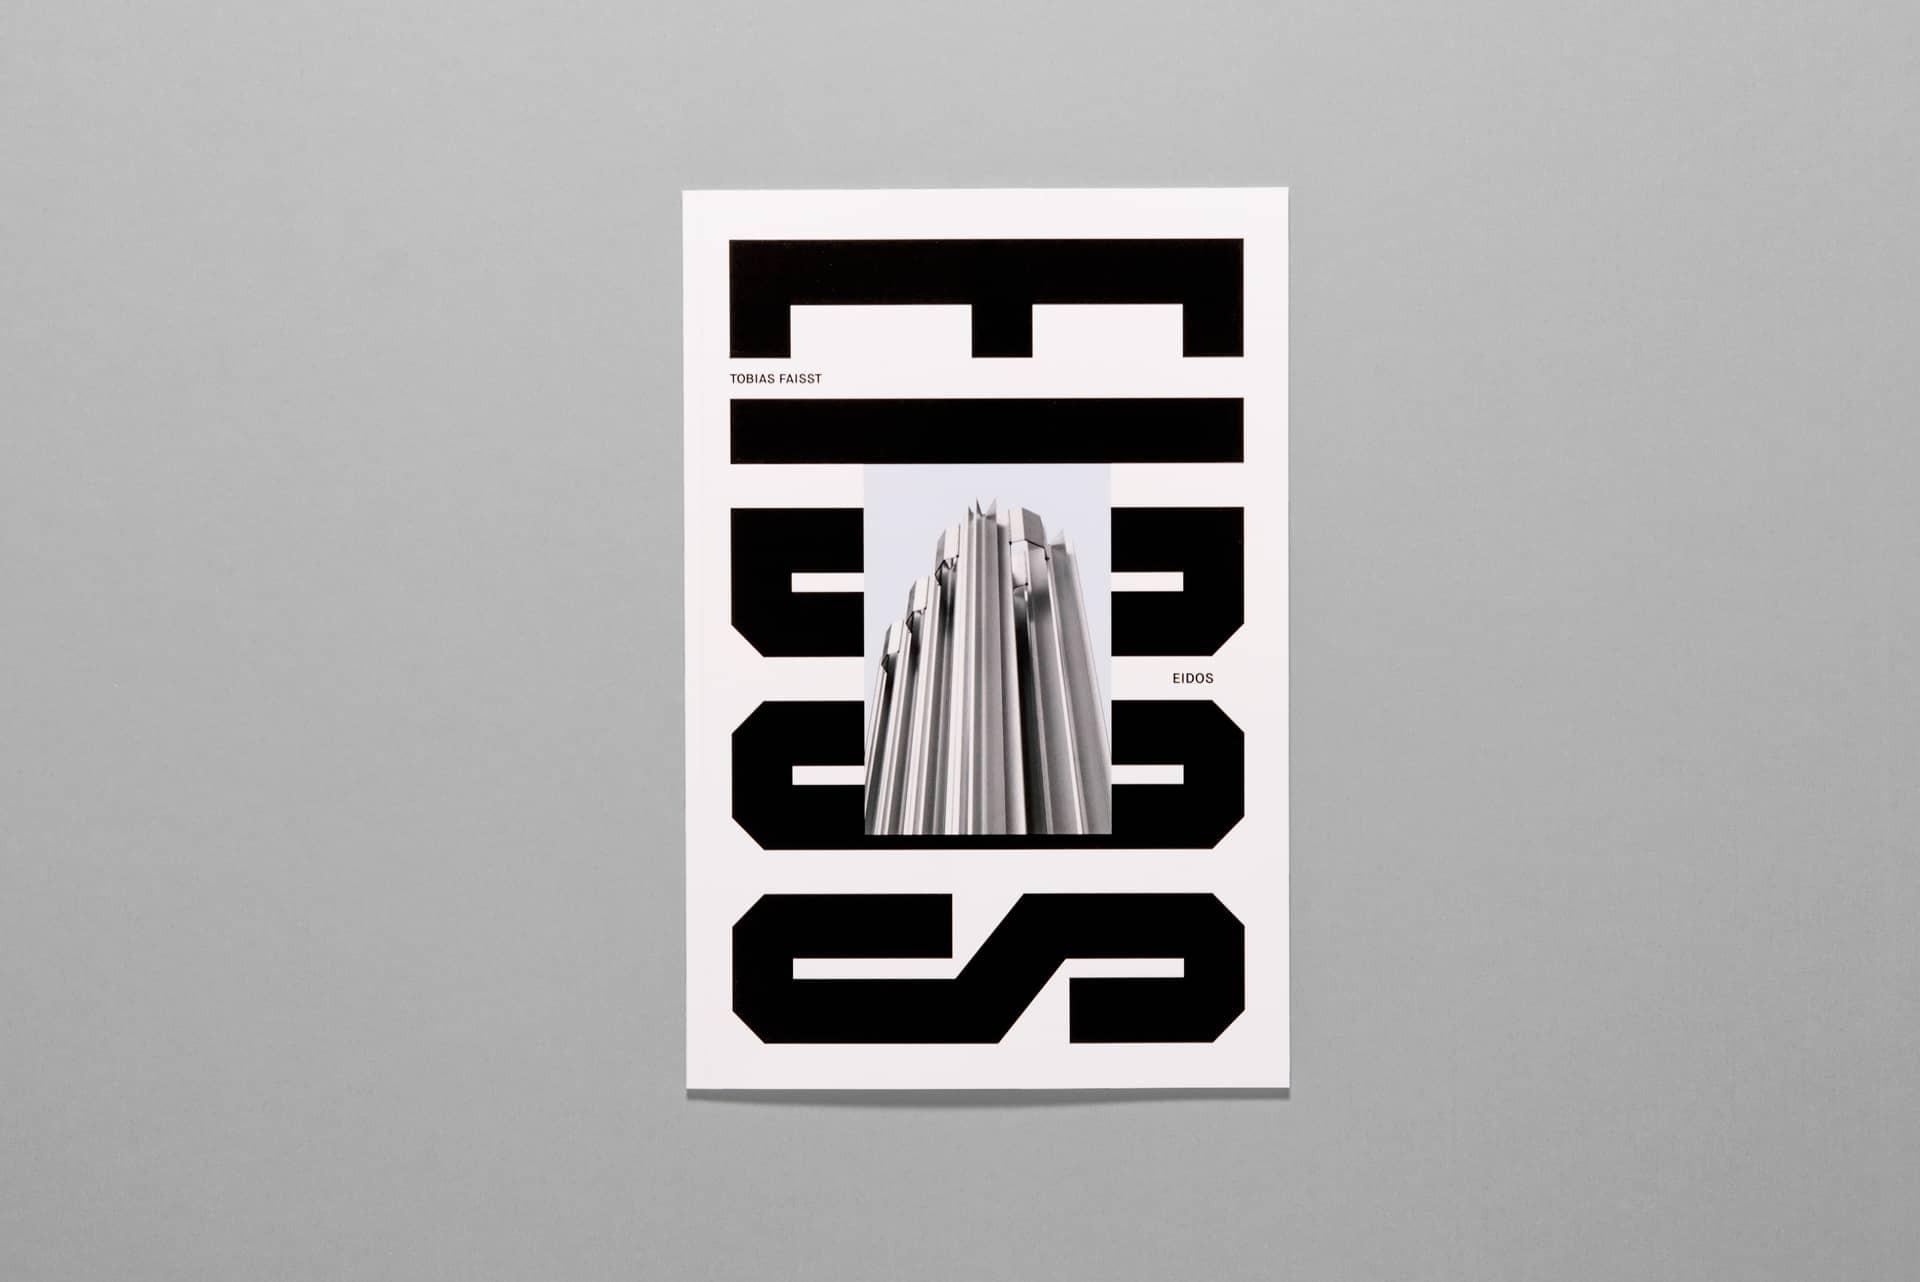 Tobias Faisst EIDOS | Transmedia Project